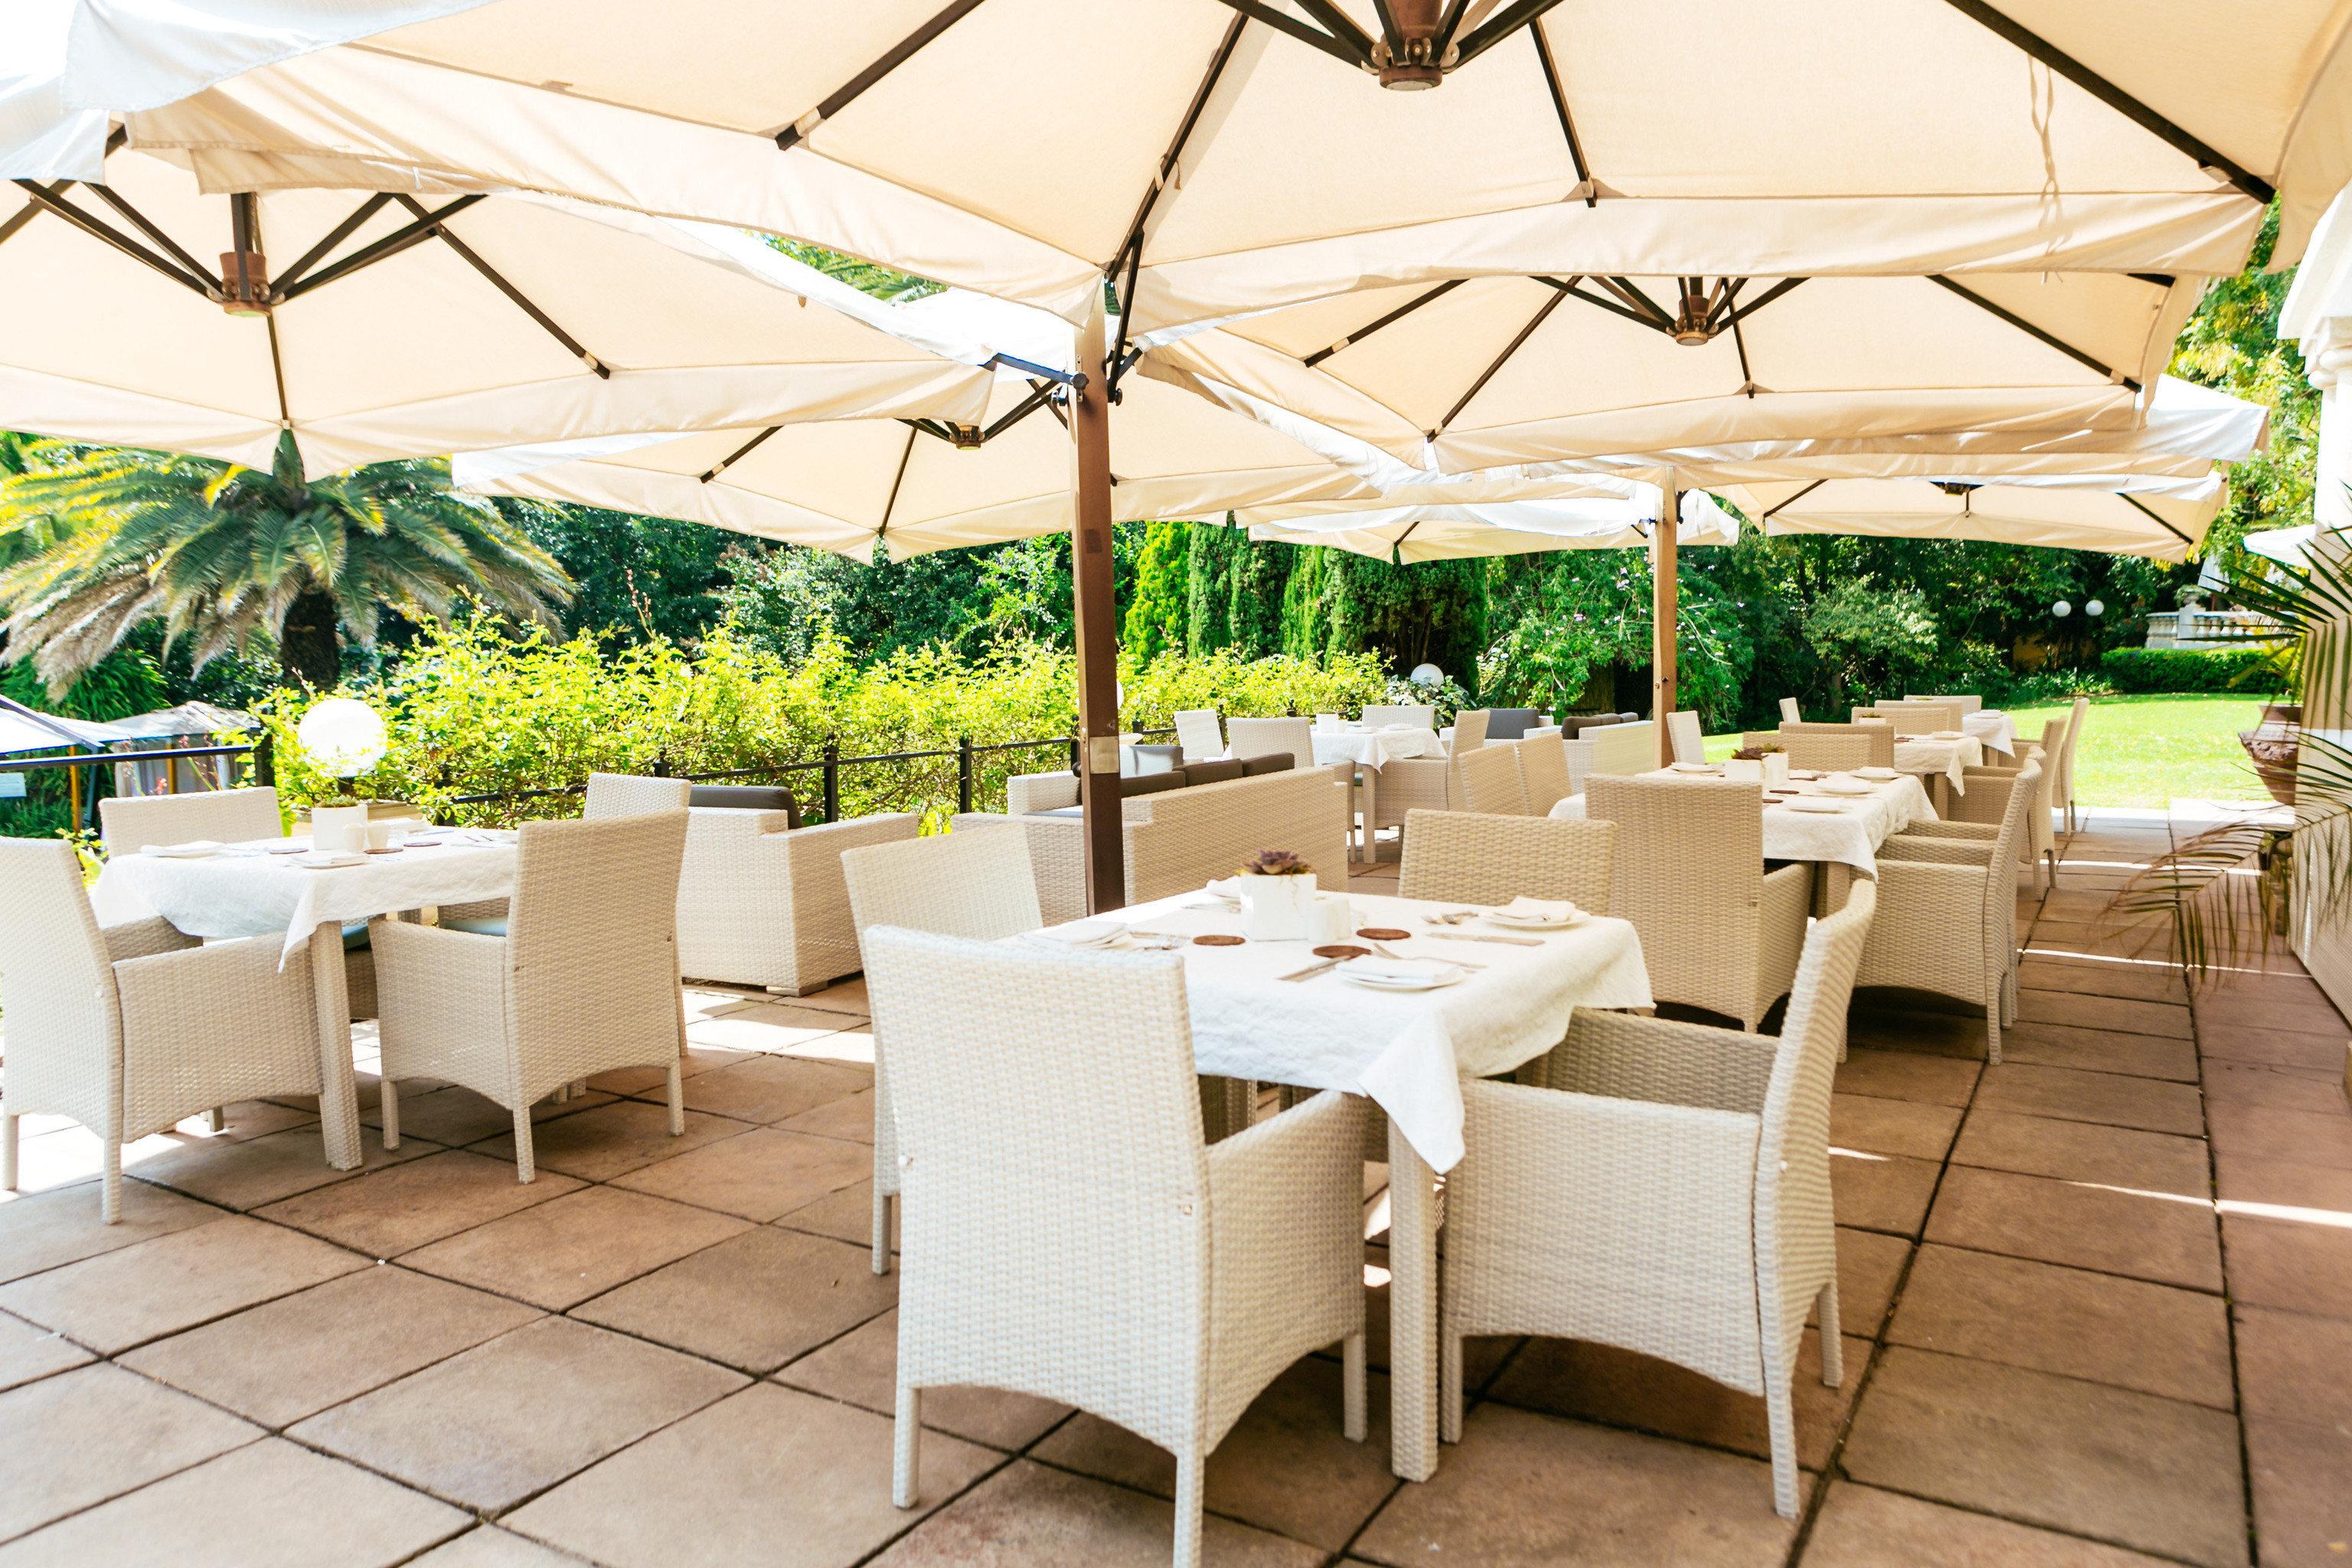 umbrella chair property restaurant Resort Villa outdoor structure